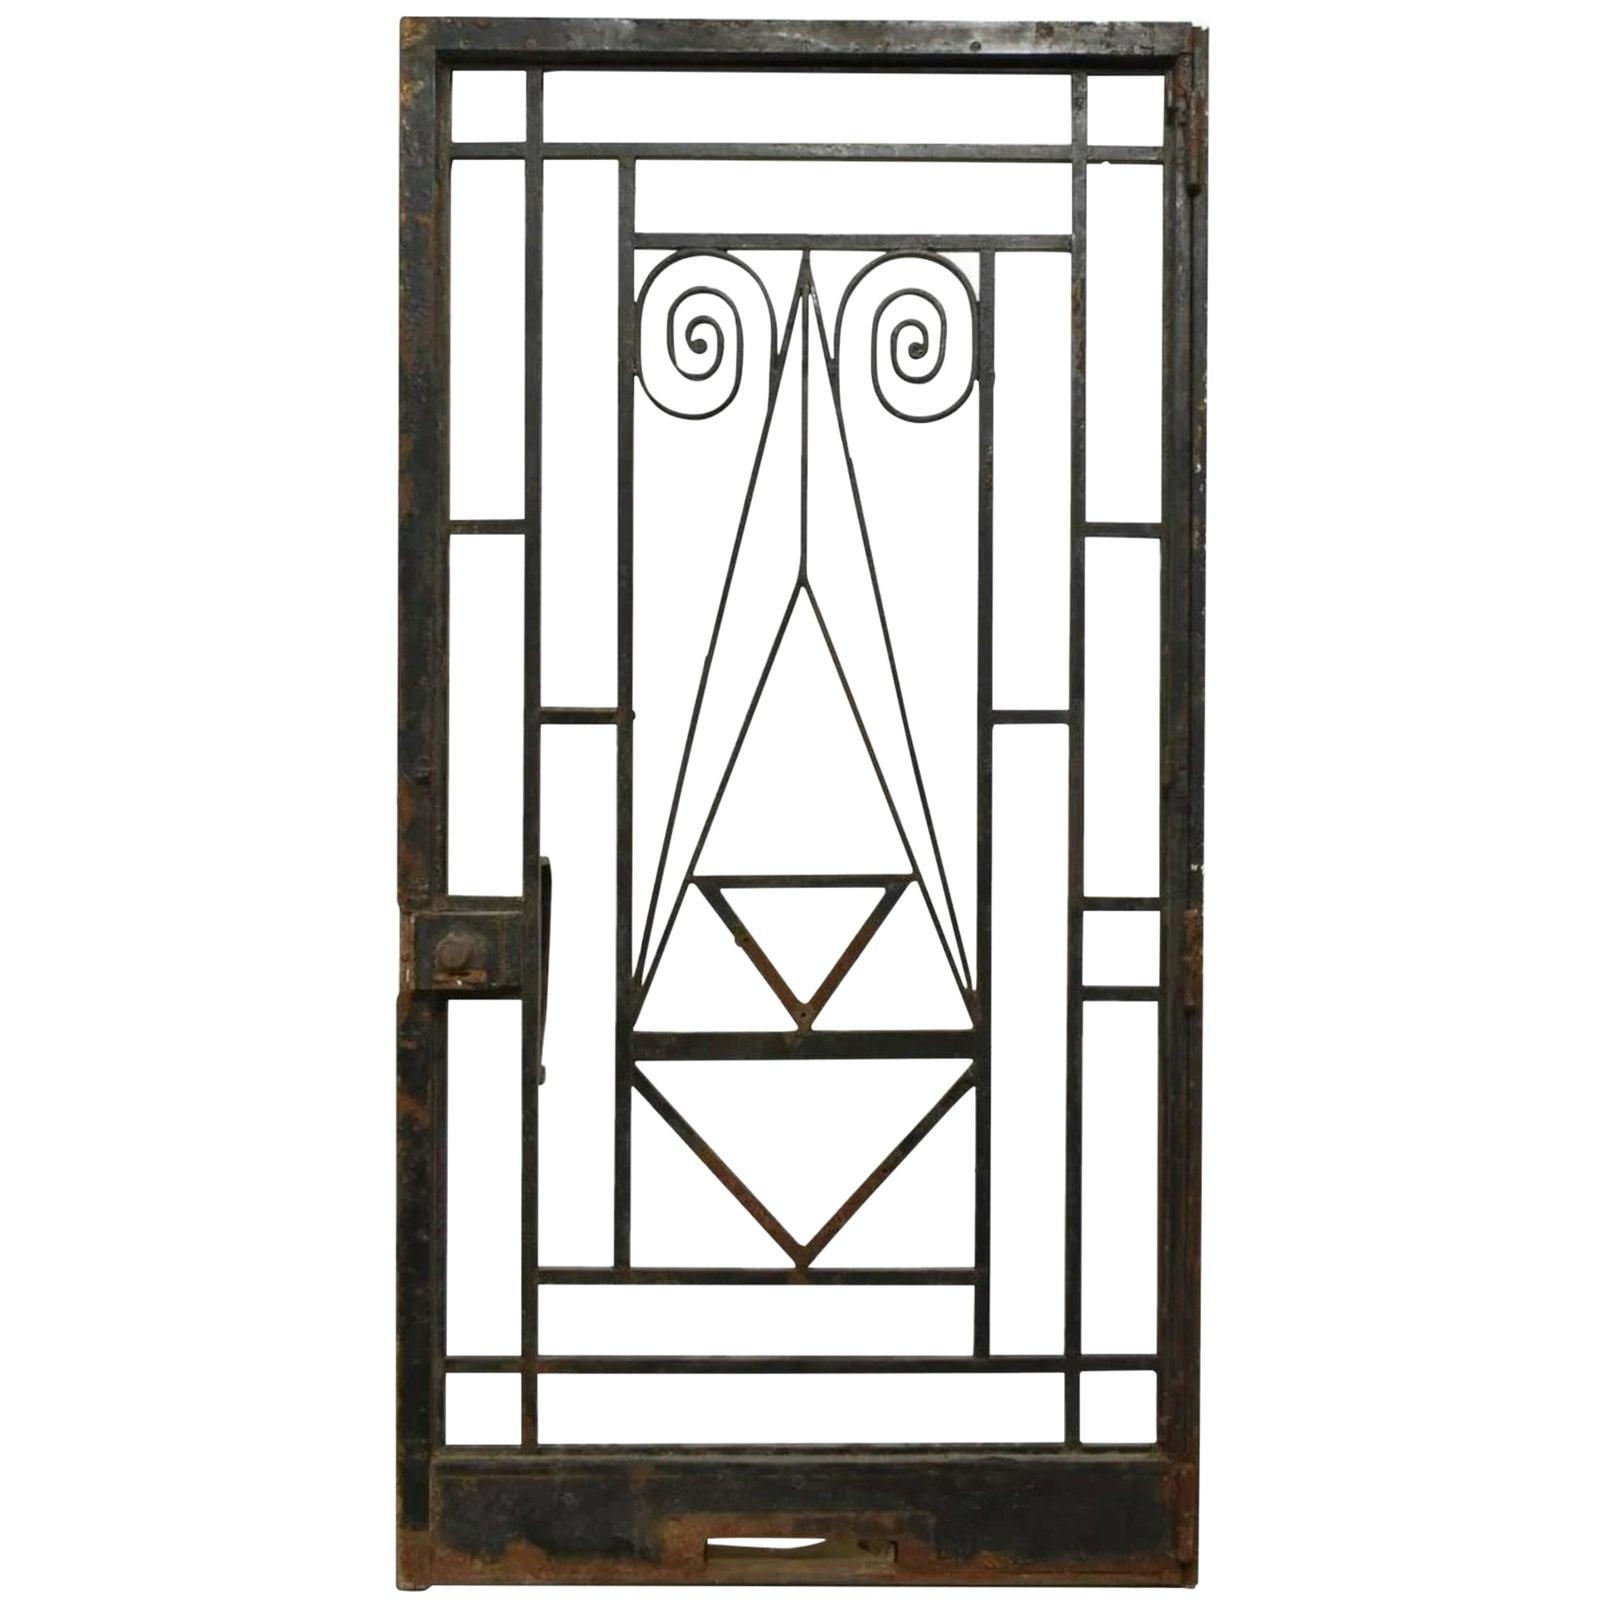 Chaise Style Art Nouveau antique french art nouveau / early art deco architectural wrought iron  openwork door